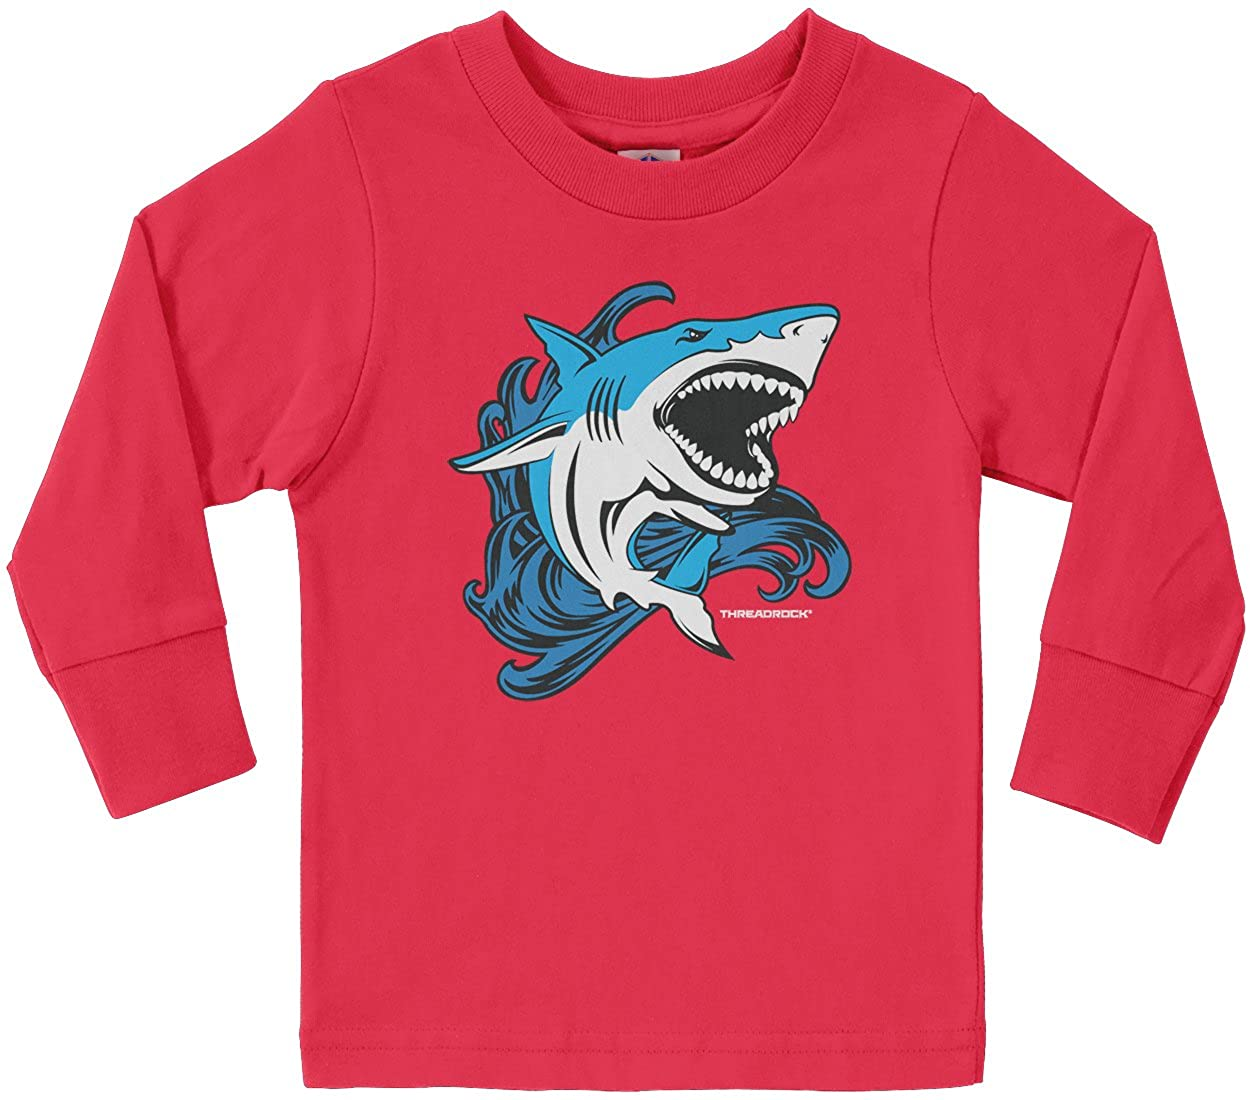 43317b840 Amazon.com: Threadrock Little Boys' Shark Toddler Long Sleeve T-Shirt:  Clothing